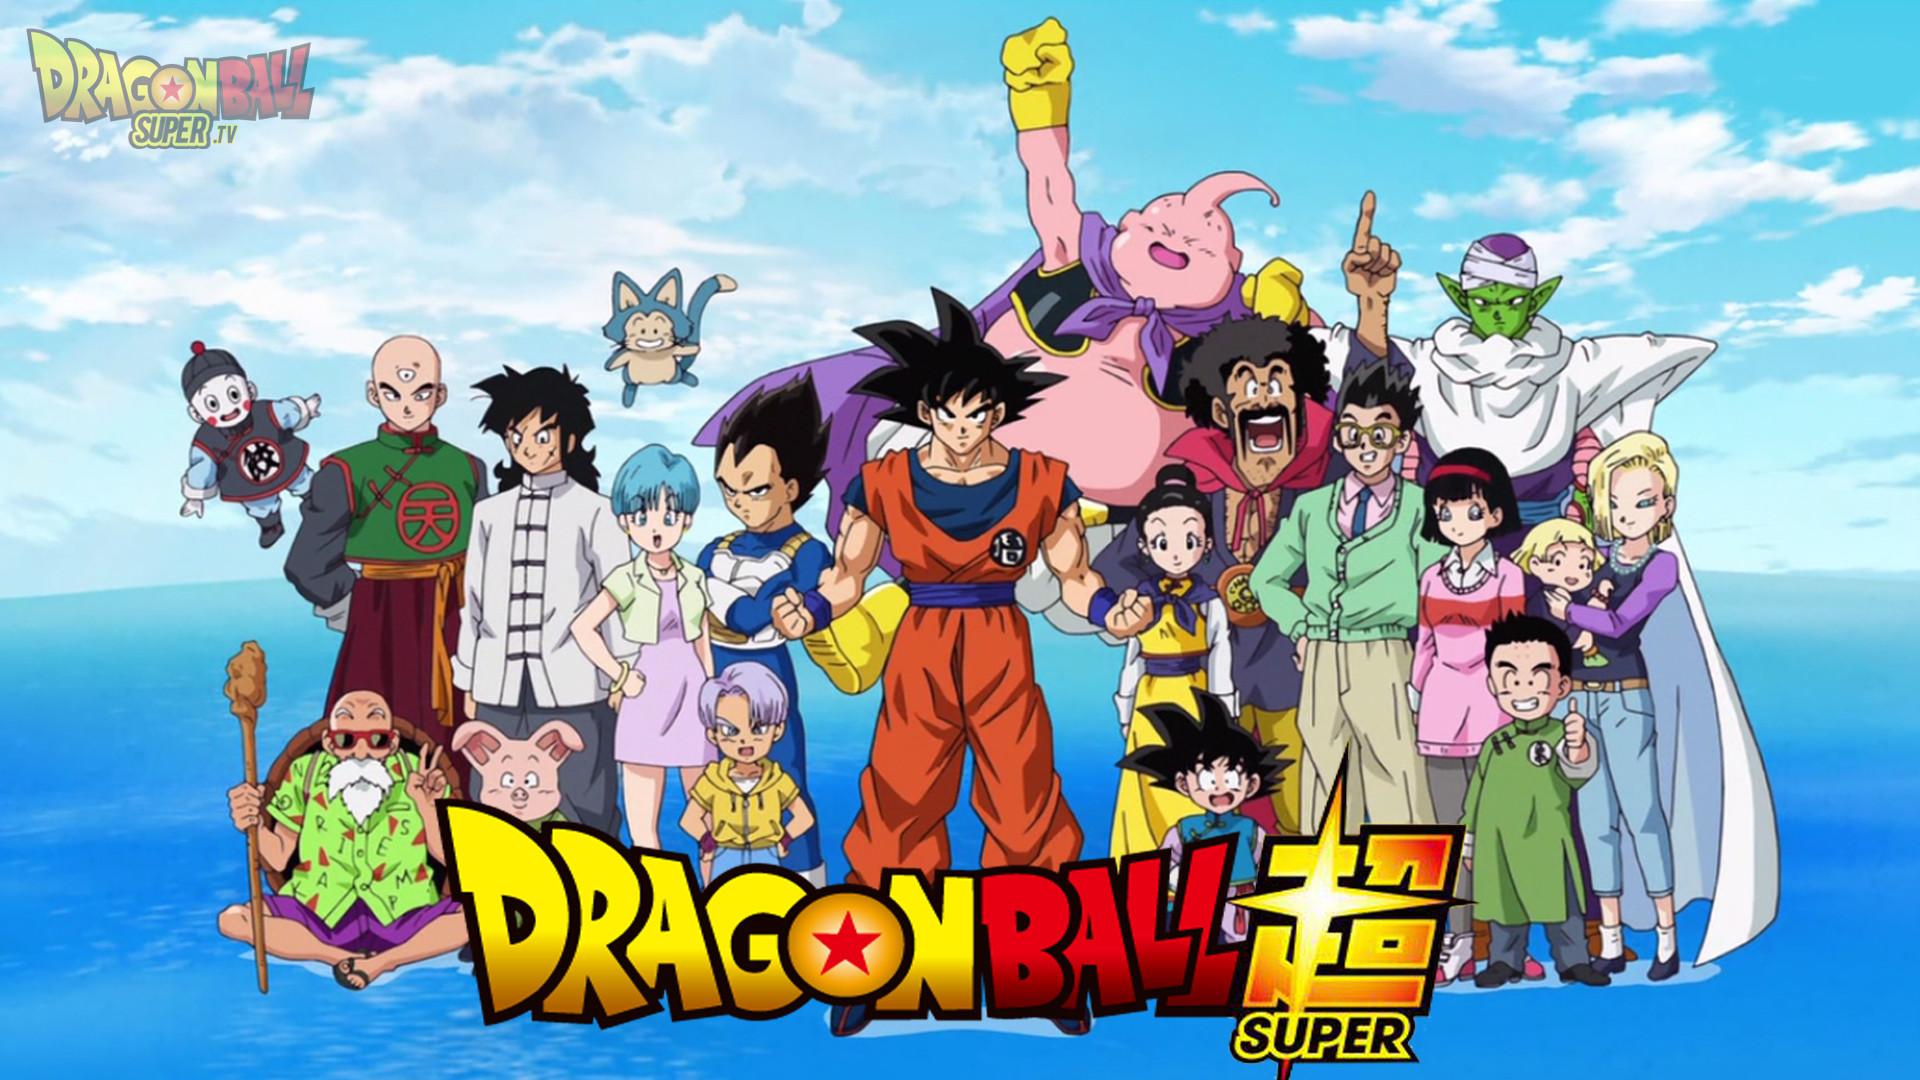 Dragon Ball Super Wallpaper HD | Picture tag | Dragonball Super